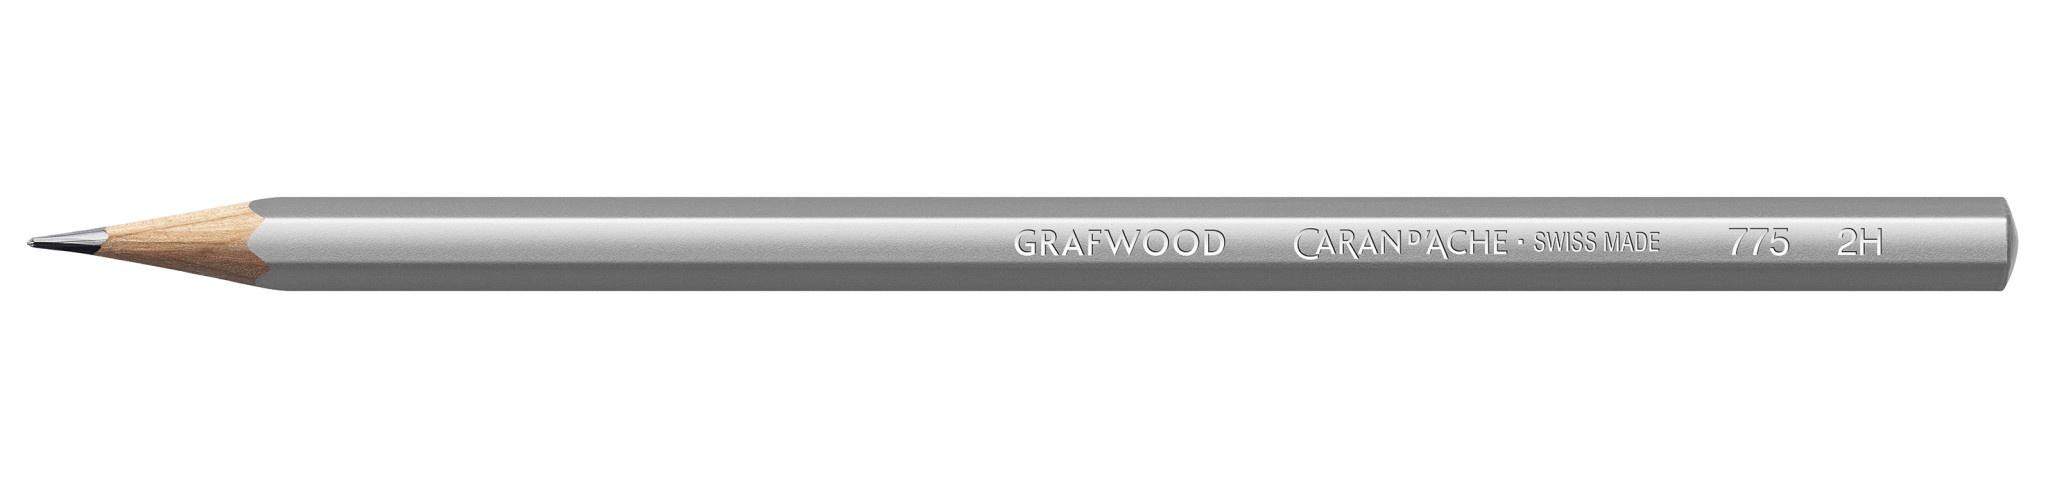 Caran d'Ache caran d'ache grafwood 2H